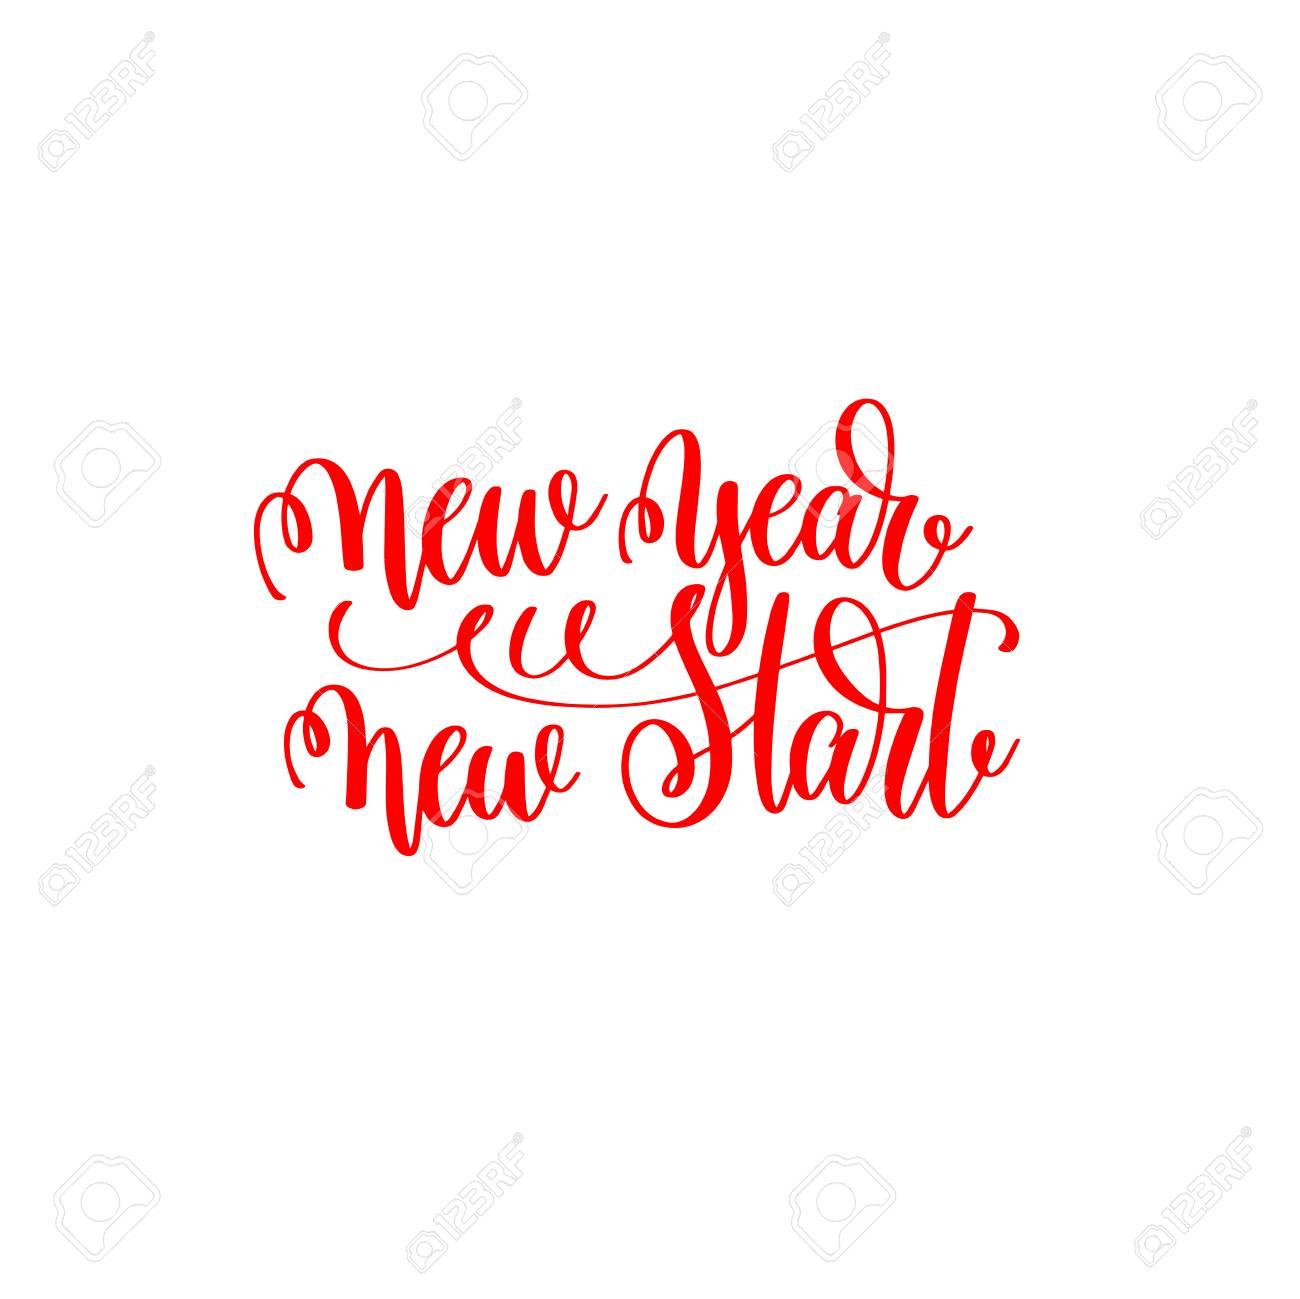 New Year New Start - Red Hand Lettering Motivation Inscription ...